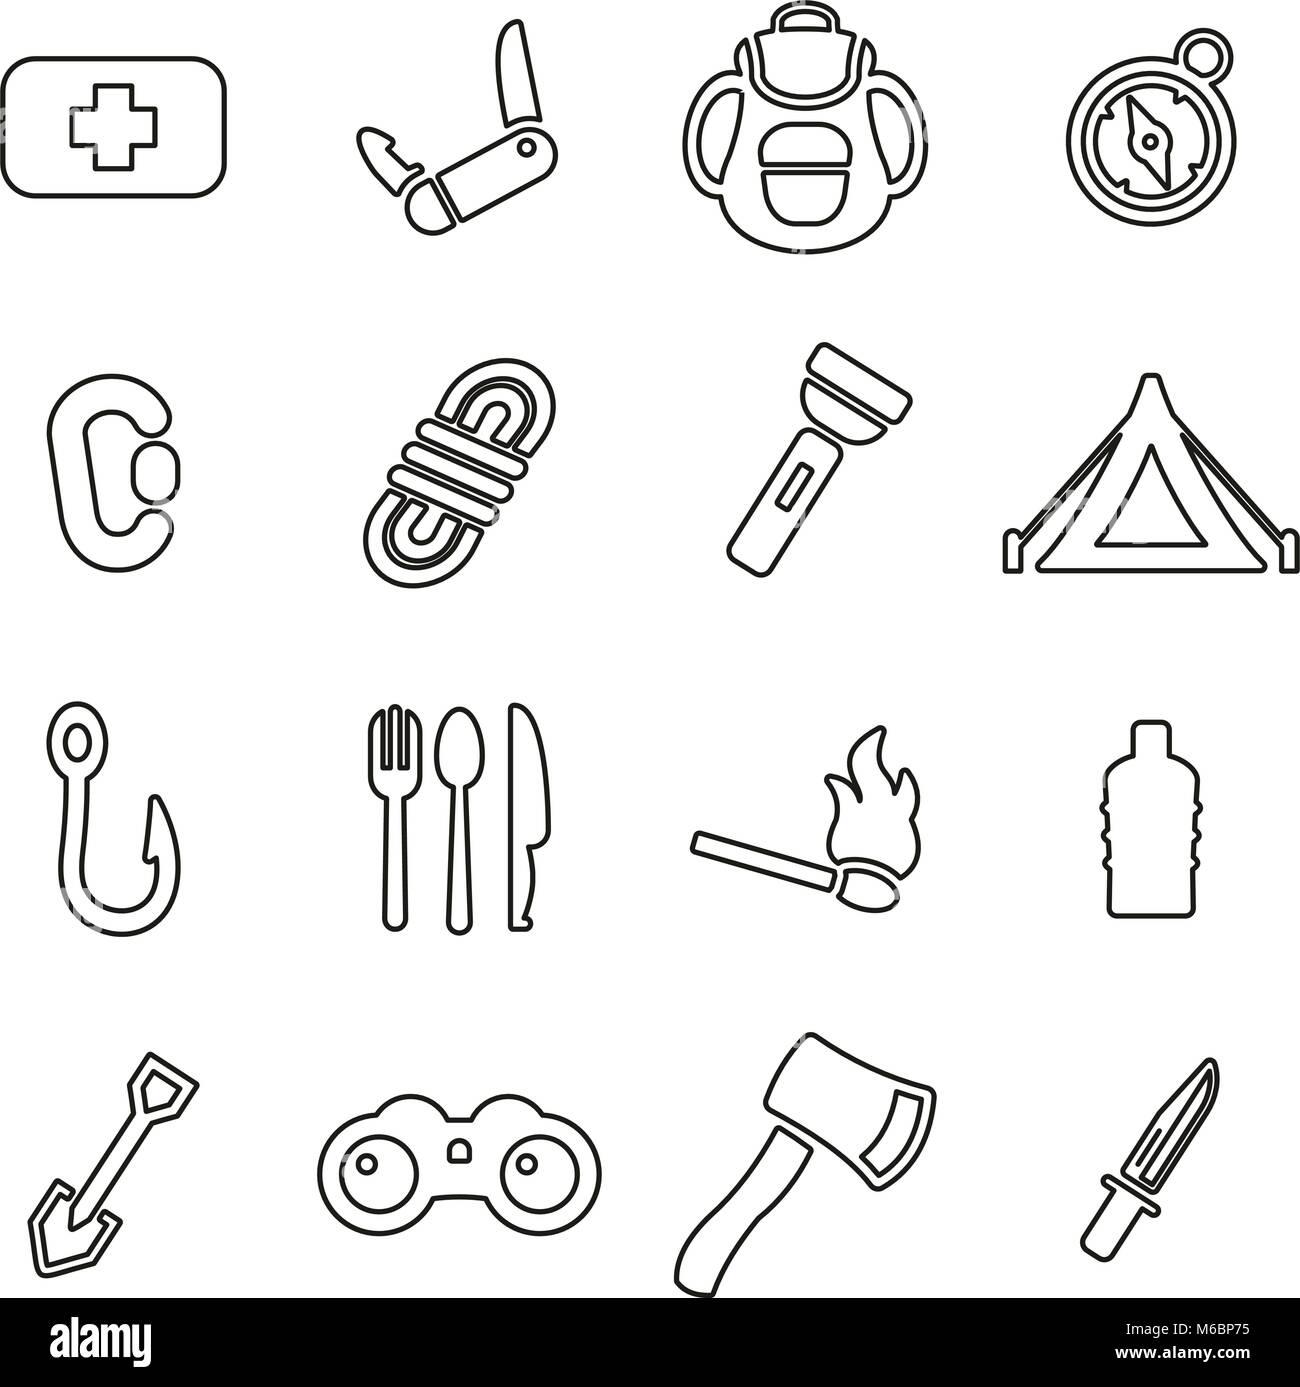 Survival Kit Icons Thin Line Vector Illustration Set Stock Vector Image Art Alamy